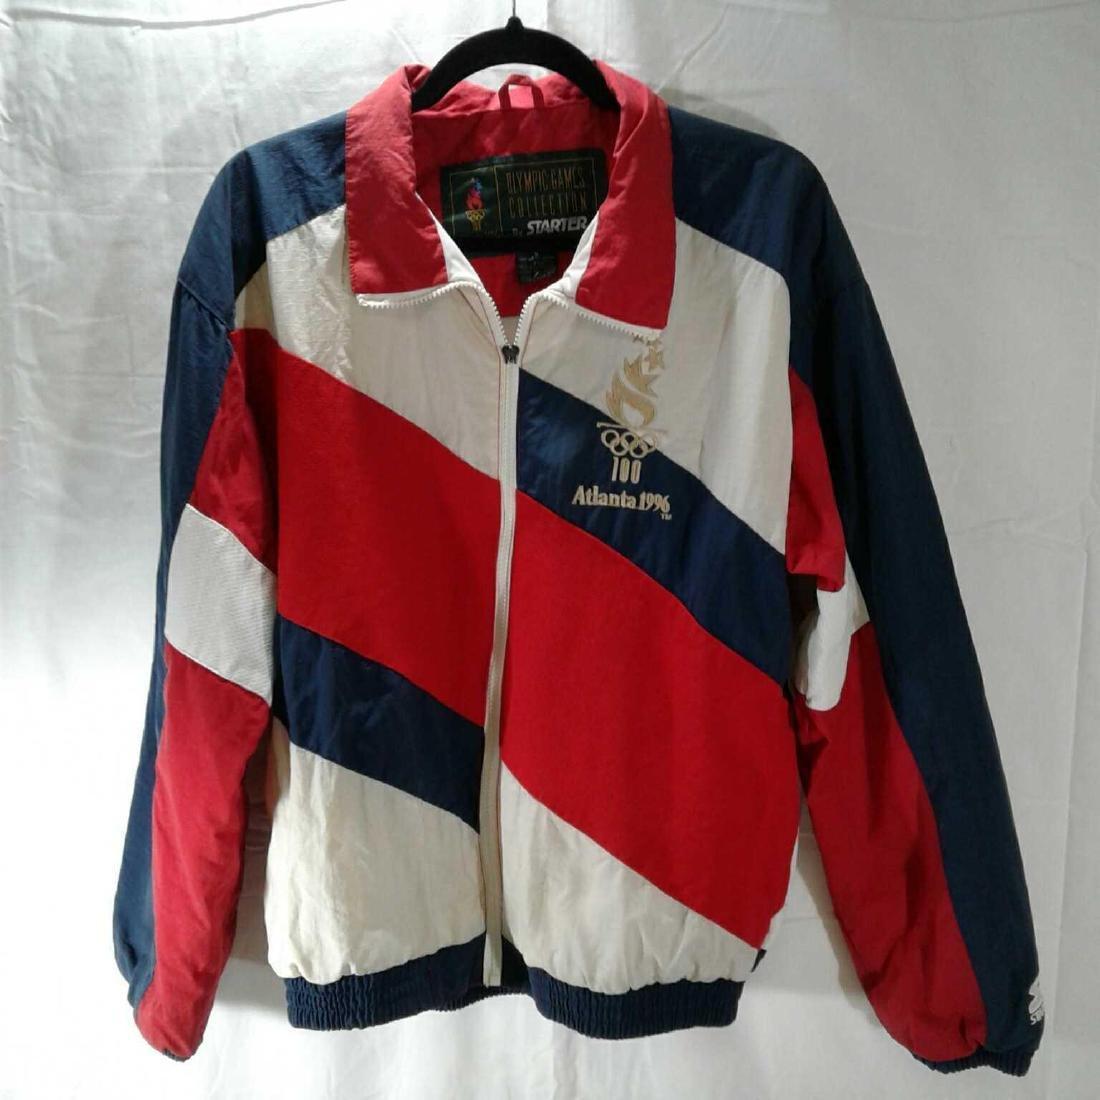 Vintage 1996 Atlanta Olympics Starter Jacket, Small